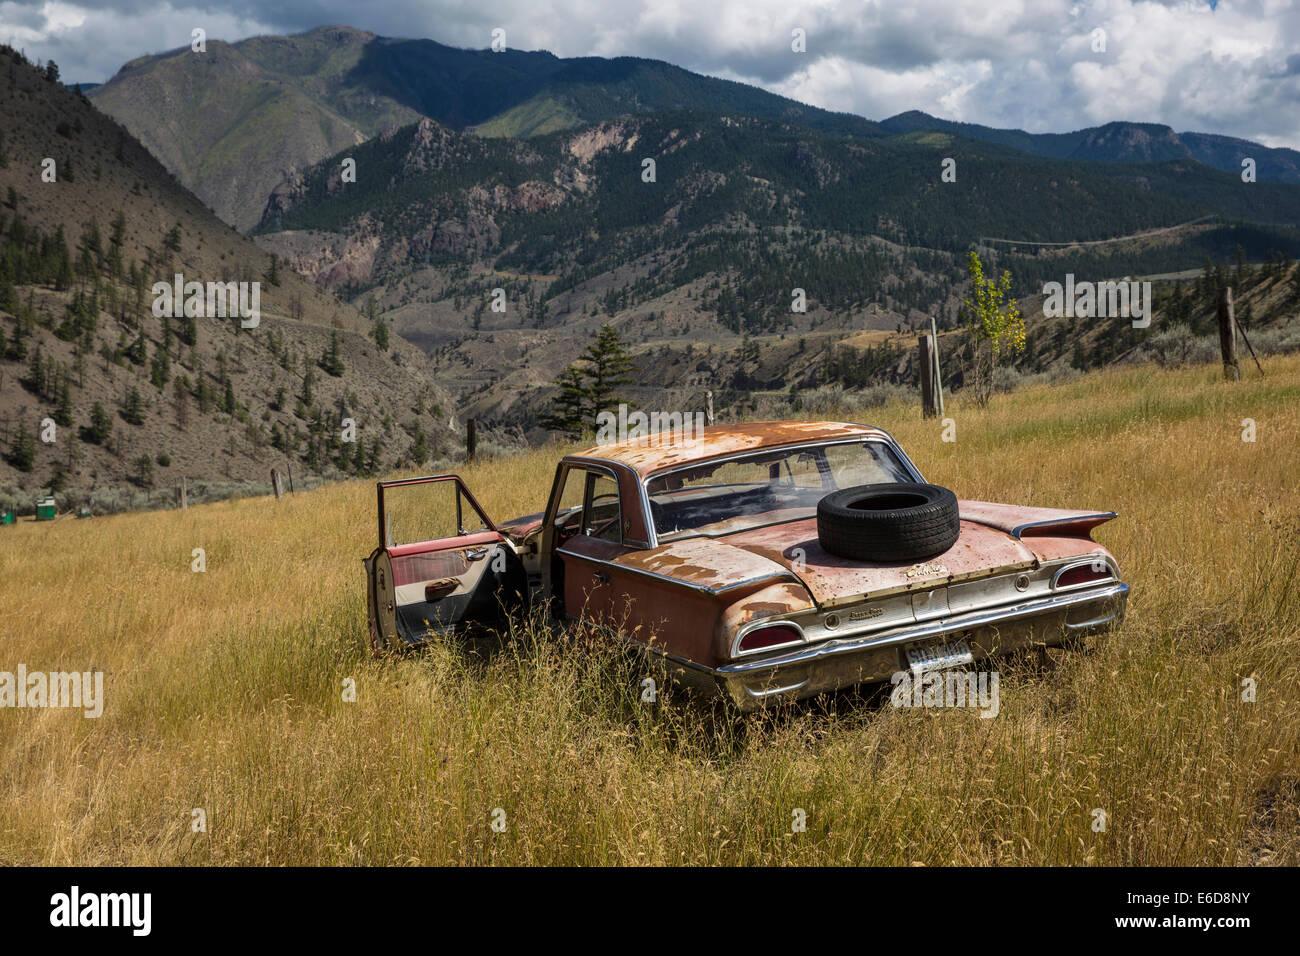 Canada, British Columbia, Rusted car at Cache Creek - Stock Image